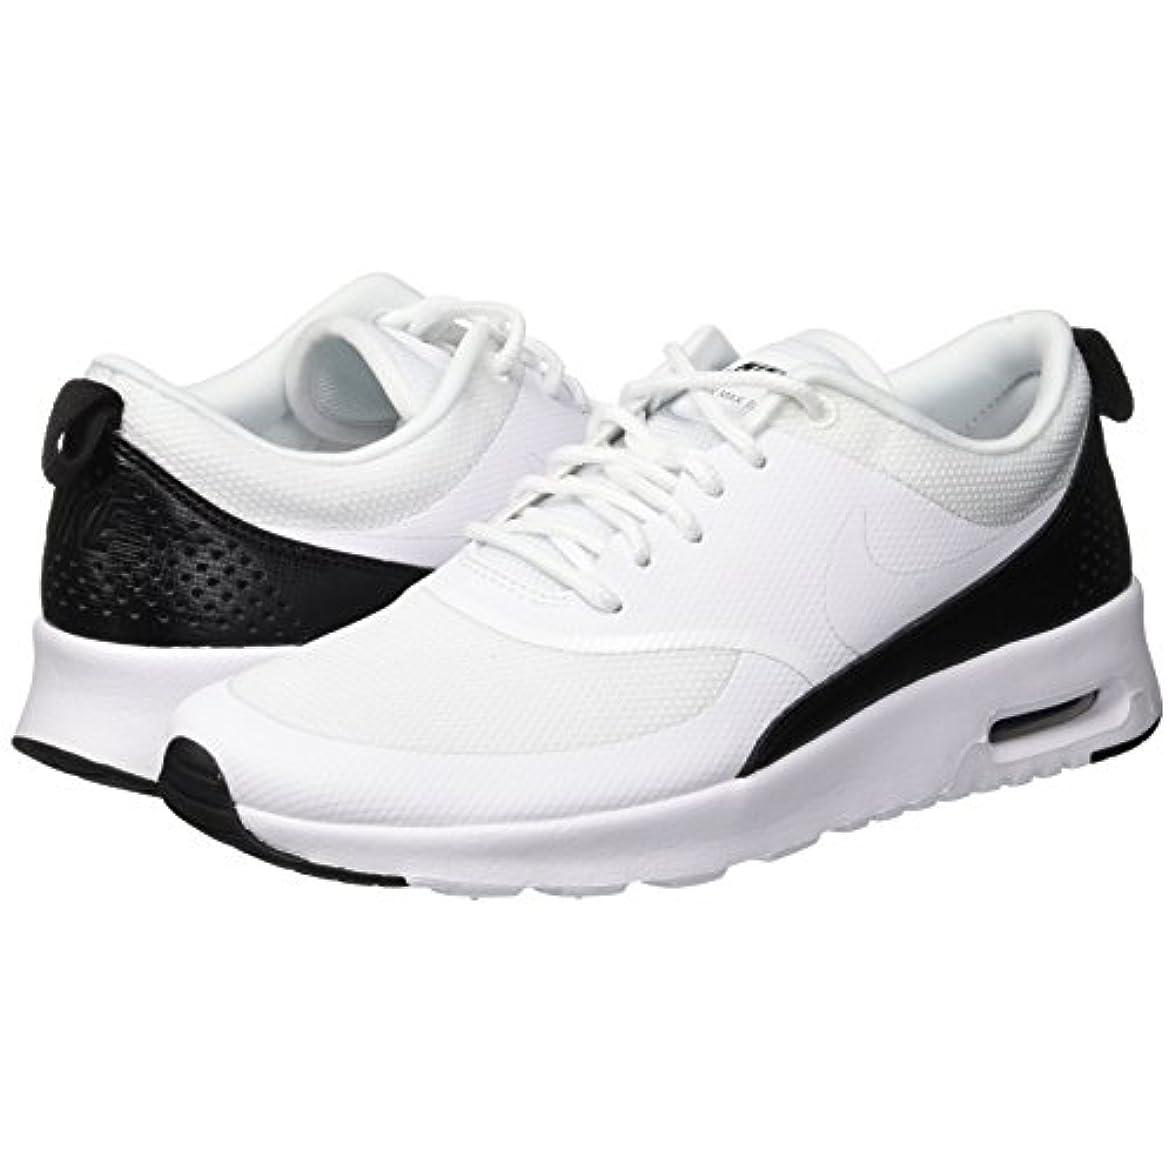 Nike Wmns Air Max Thea Scarpe Da Fitness Donna